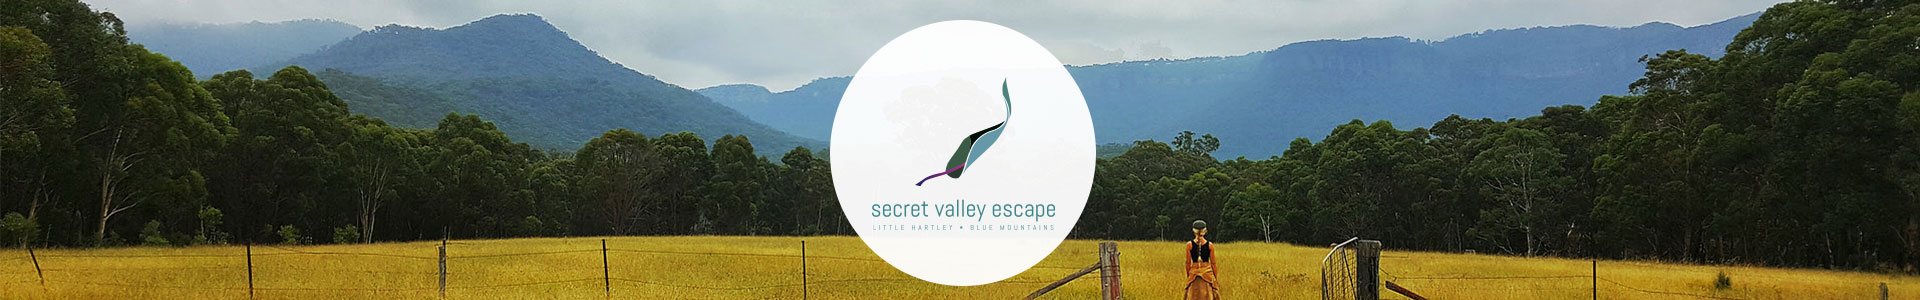 Secret Valley Escape header